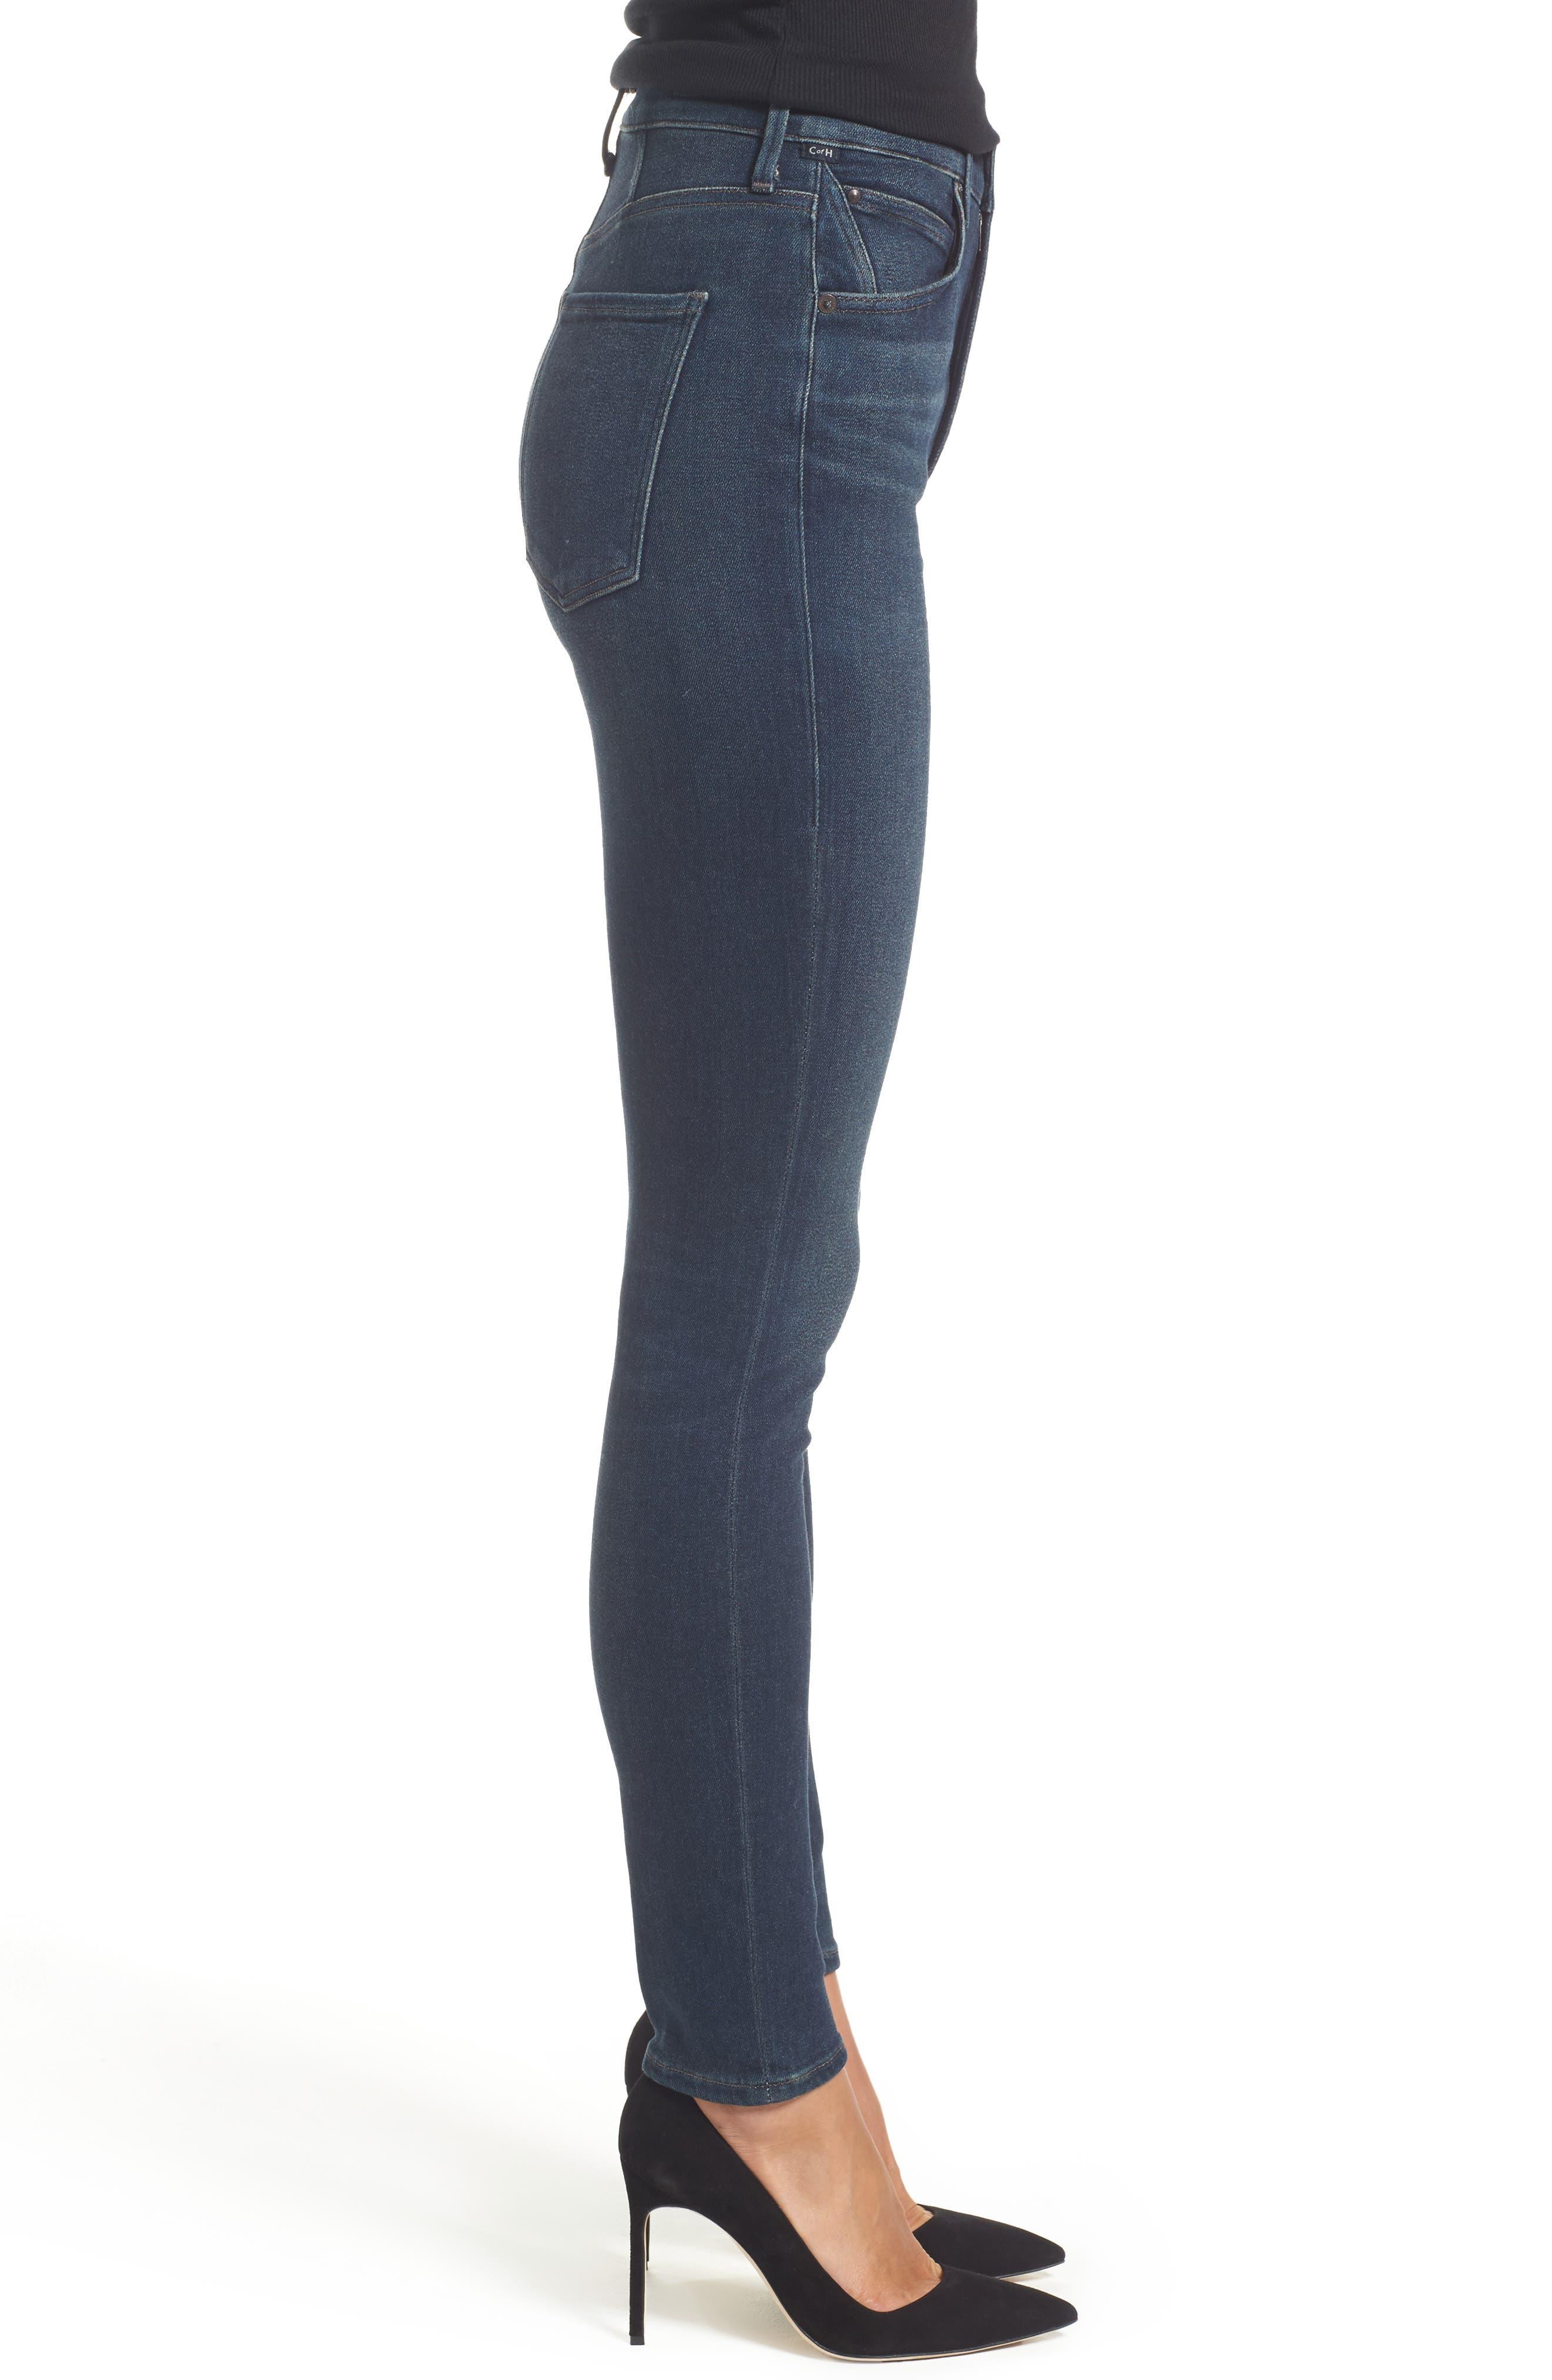 Alternate Image 3  - Citizens of Humanity Chrissy High Waist Skinny Jeans (Haze)